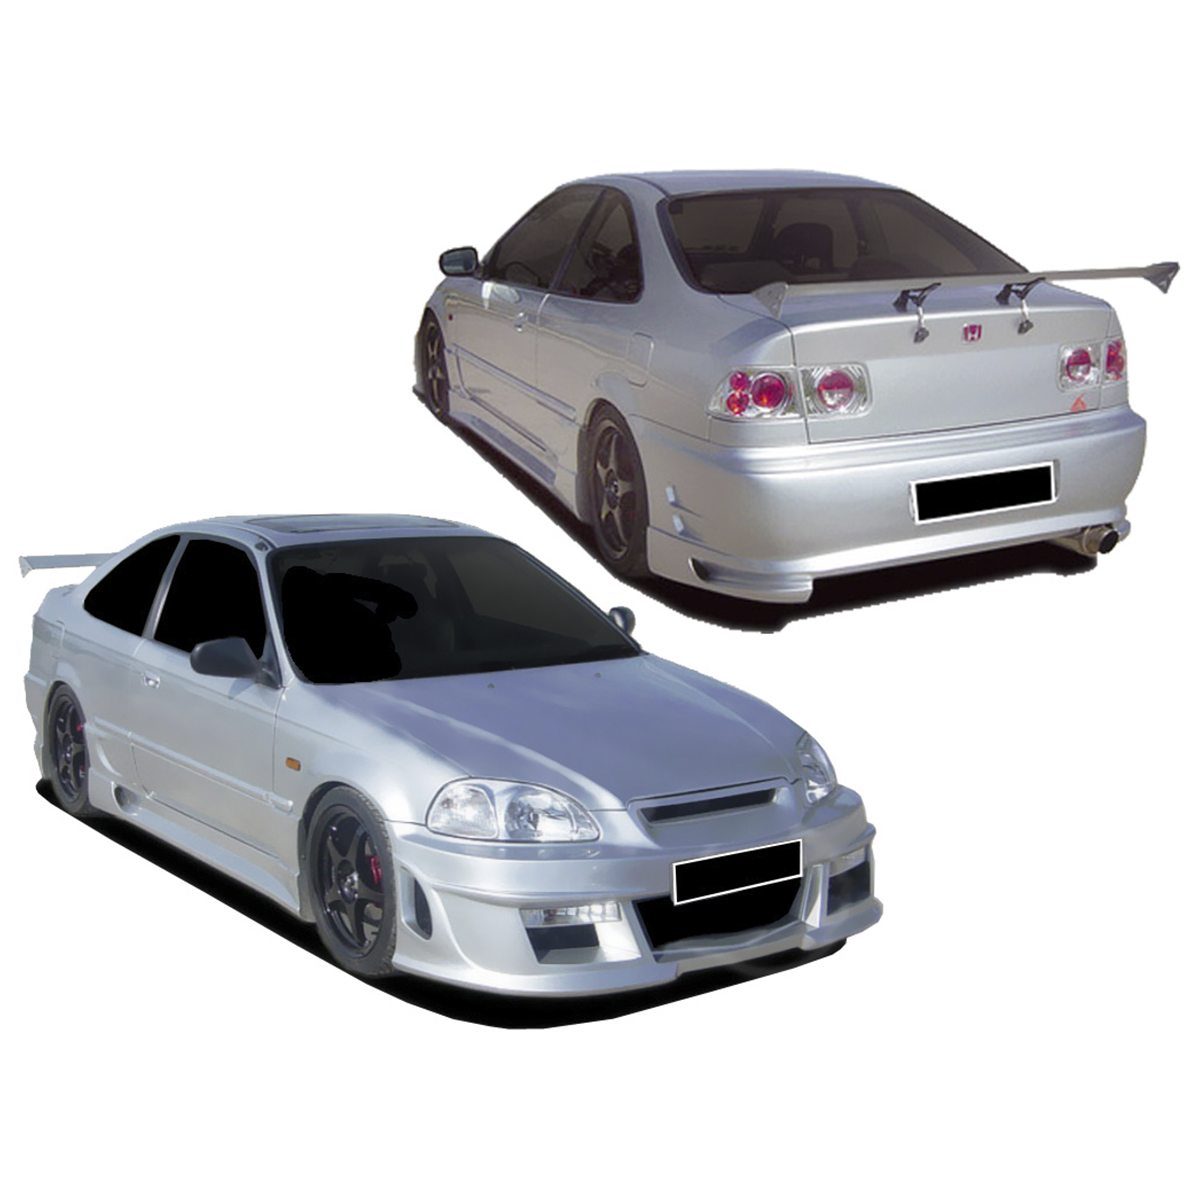 Honda-Civic-98-Coupe-Twister-KIT-QTU107